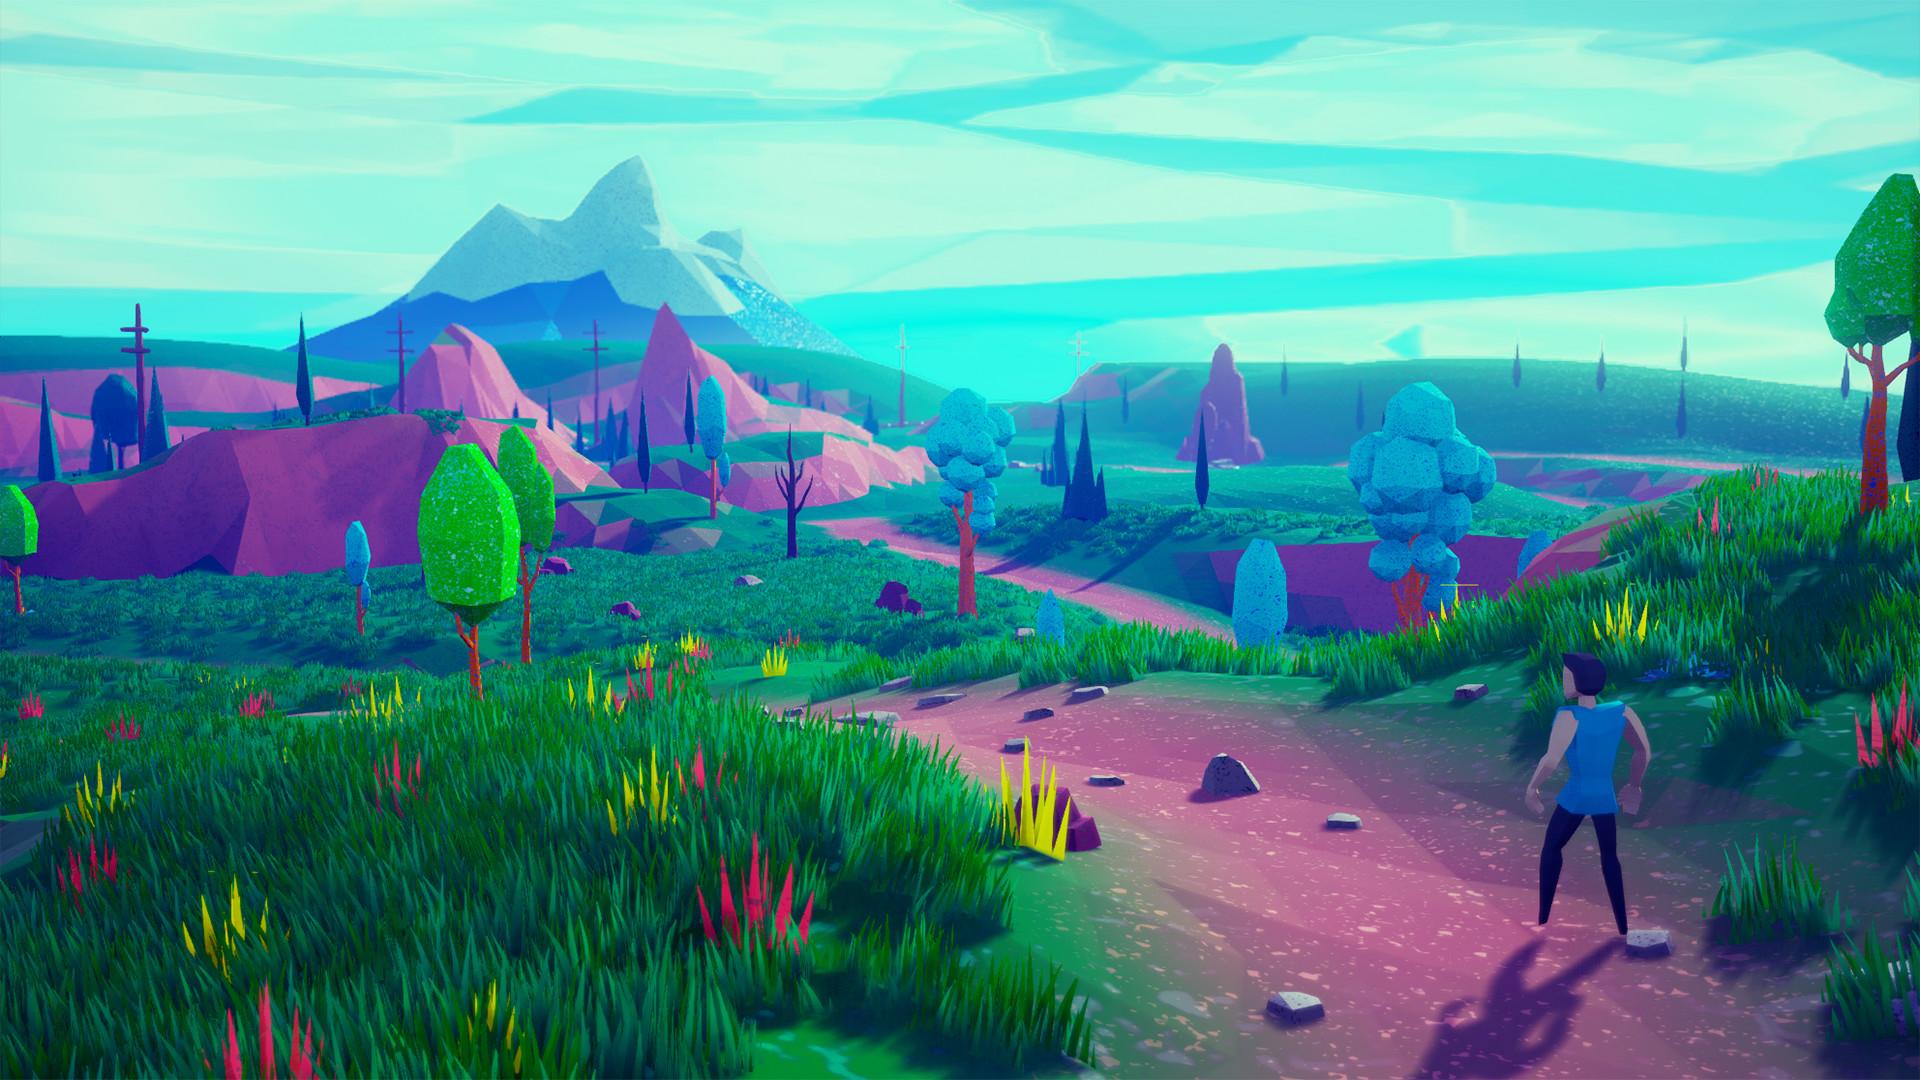 ArtStation - Lowpoly Stylized Project Update / Unreal Engine